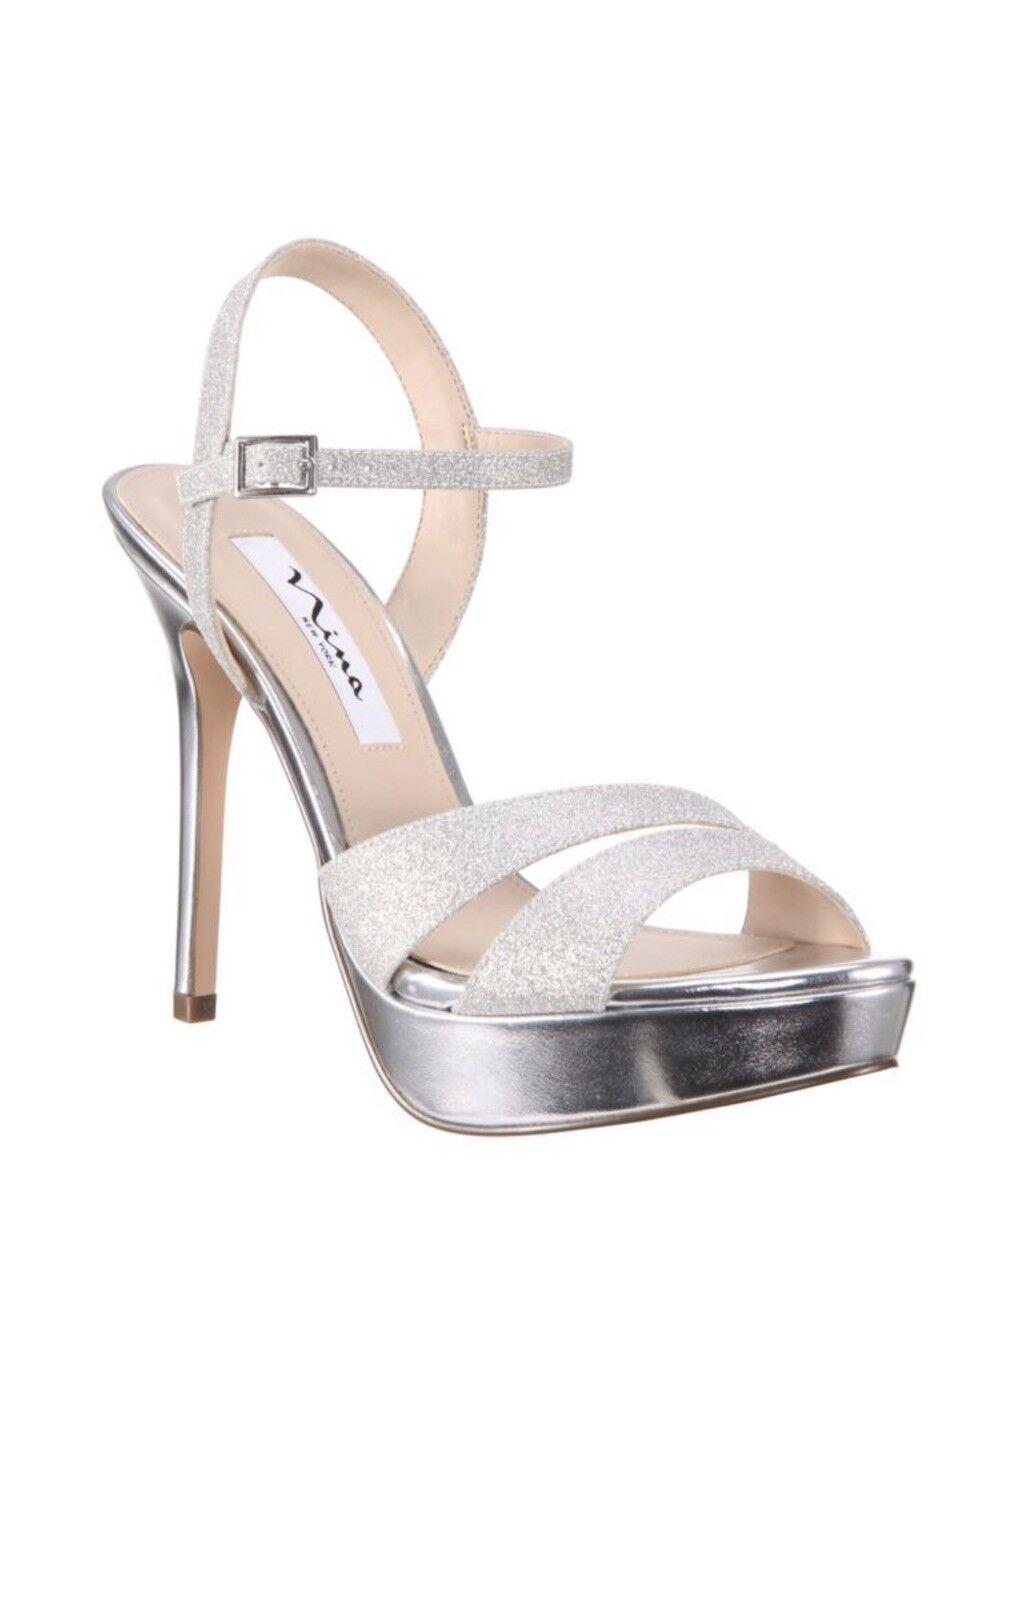 New Nina Silana argent Glitter Platform  Sandals Taille 9M.